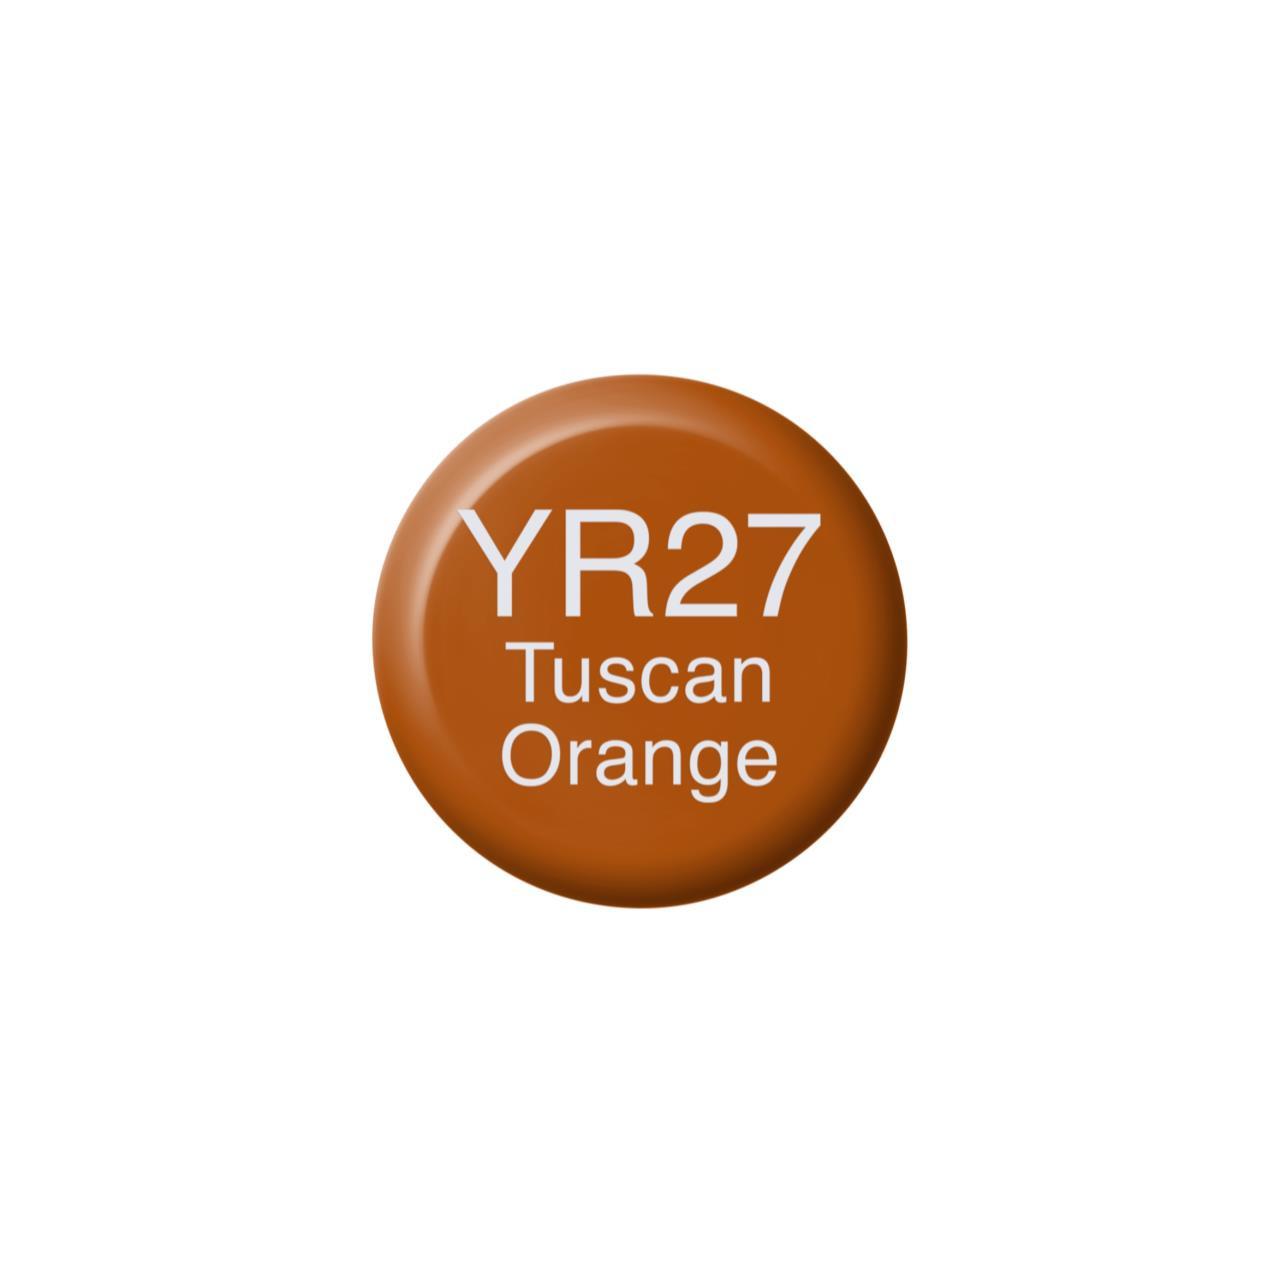 YR27 Tuscan Orange, Copic Ink - 4511338058749